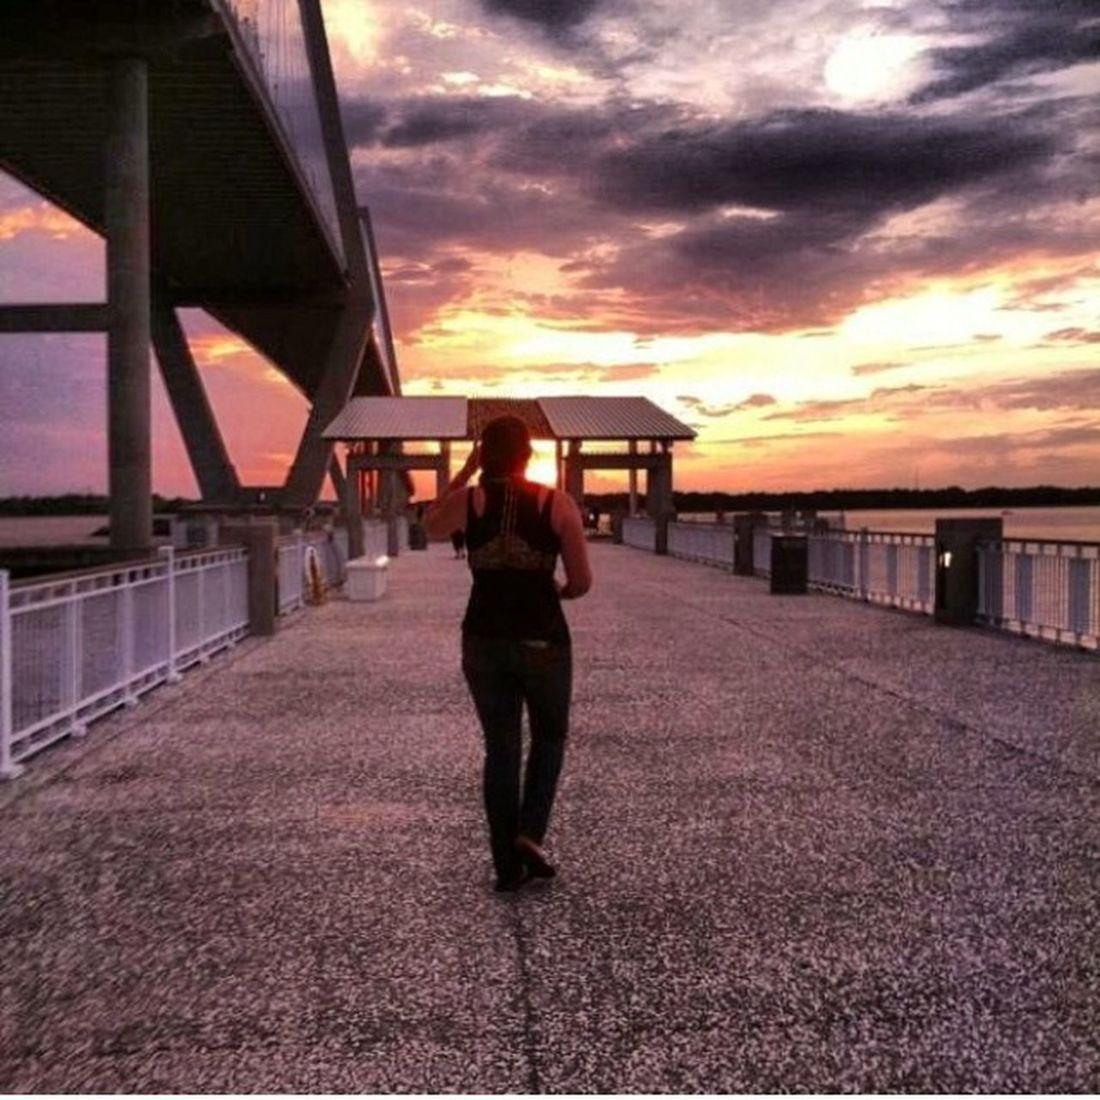 My best friend walking in front of me on the pier as the sun was setting Sunset Pier Best Friend